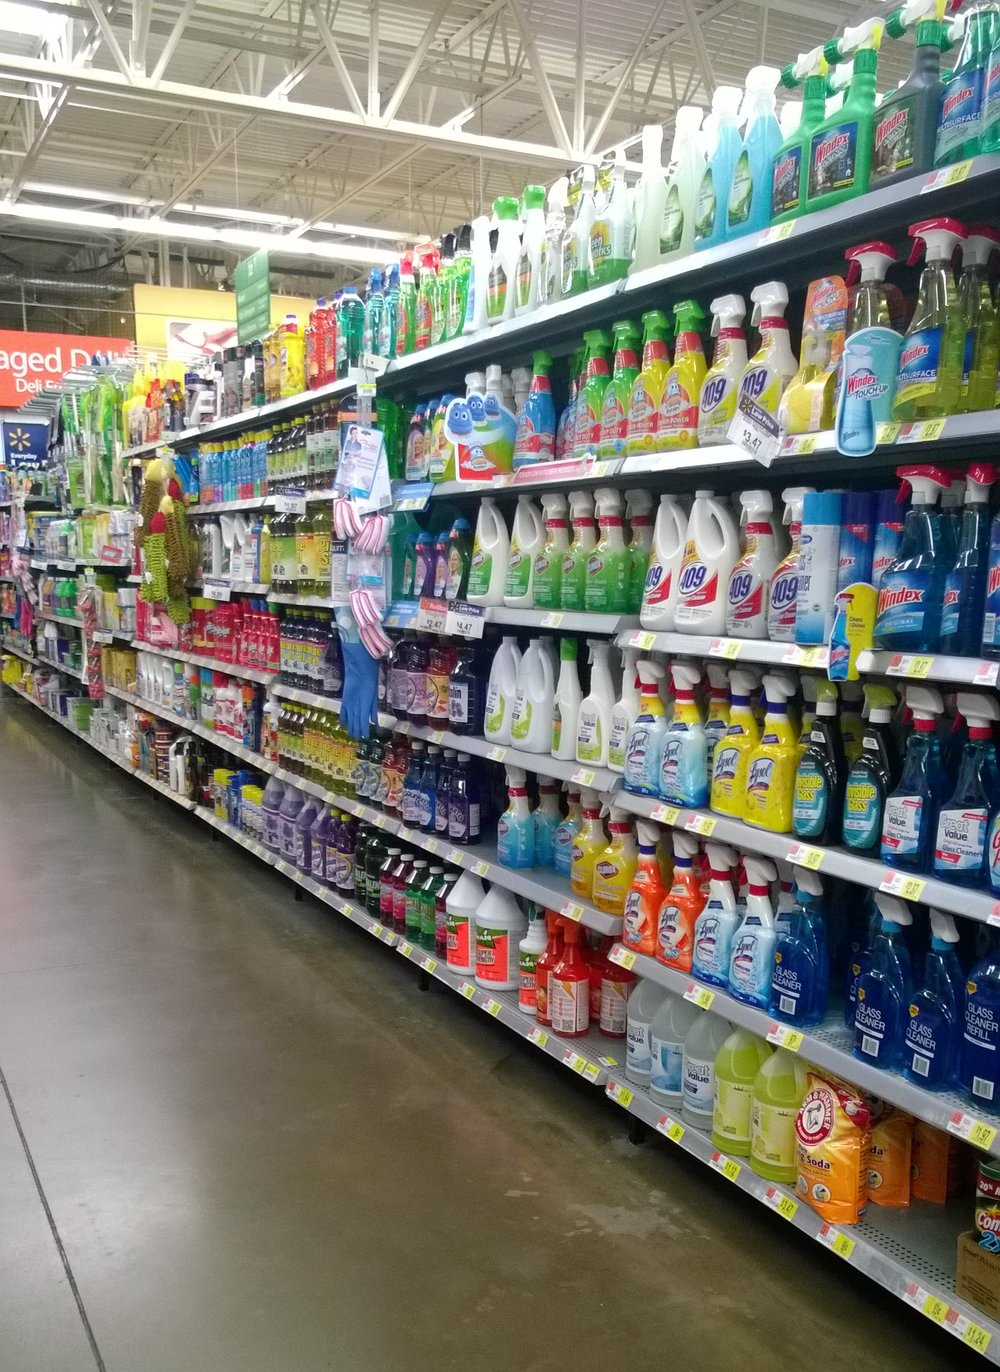 Walmart_Fabuloso_Aisle.jpg